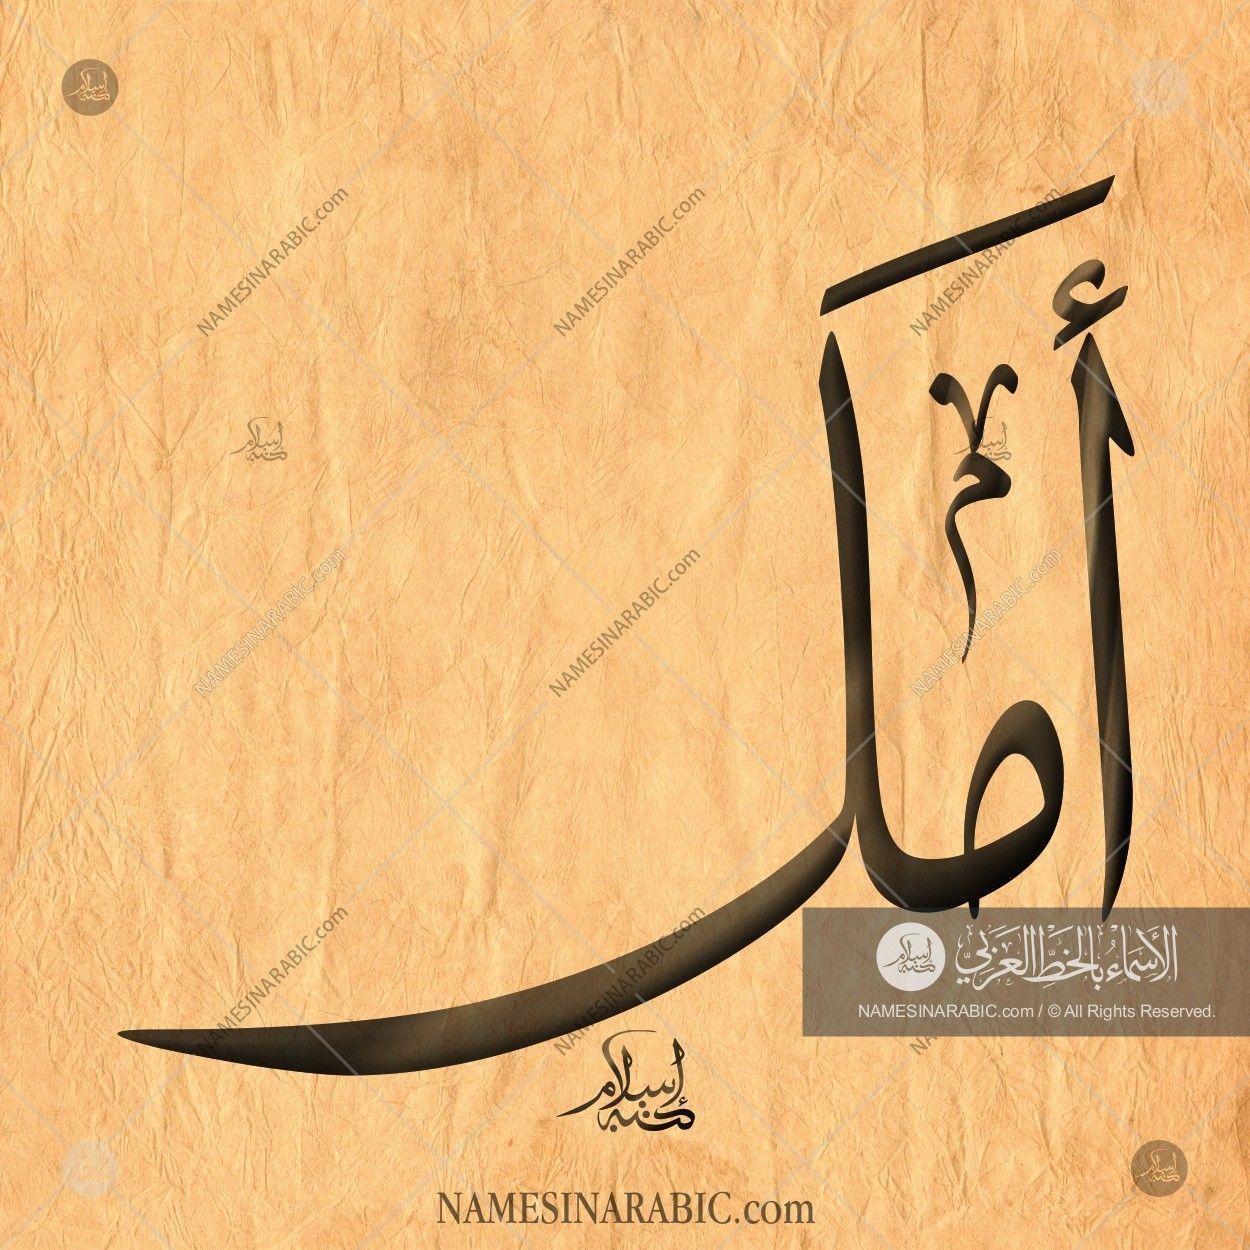 Amal Name In Arabic Calligraphy Arabic Calligraphy Design Calligraphy Arabic Calligraphy